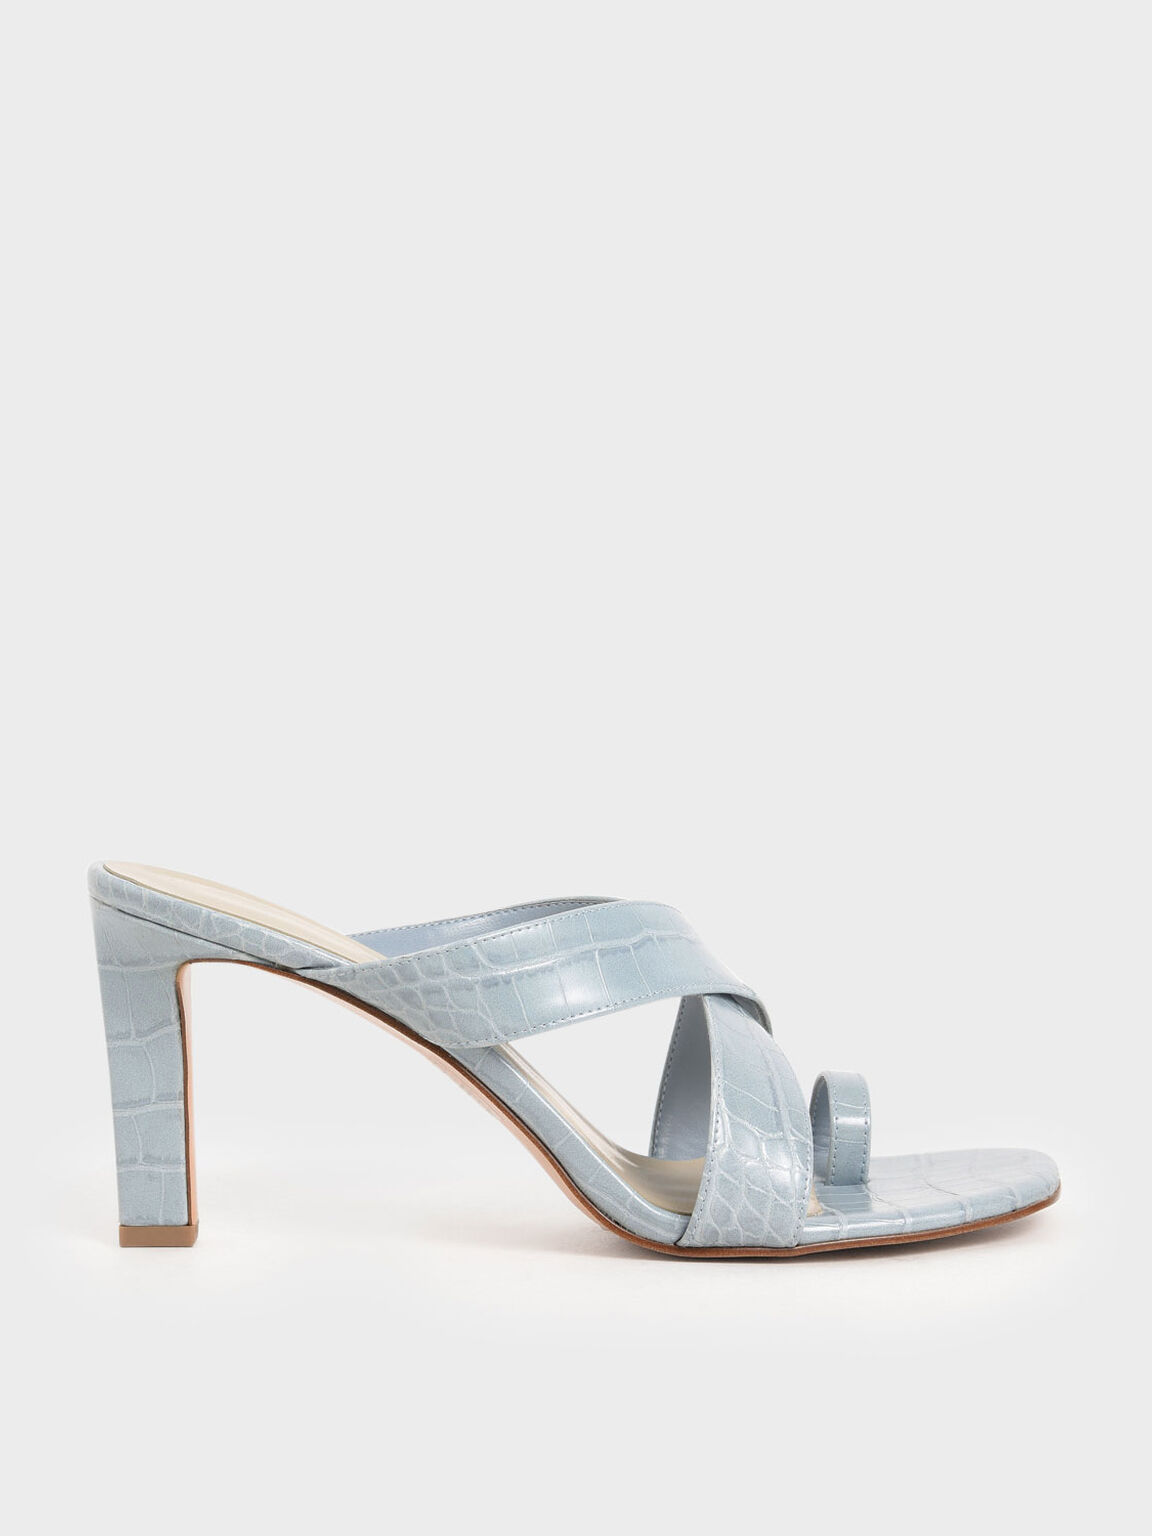 Croc-Effect Heeled Mules, Blue, hi-res